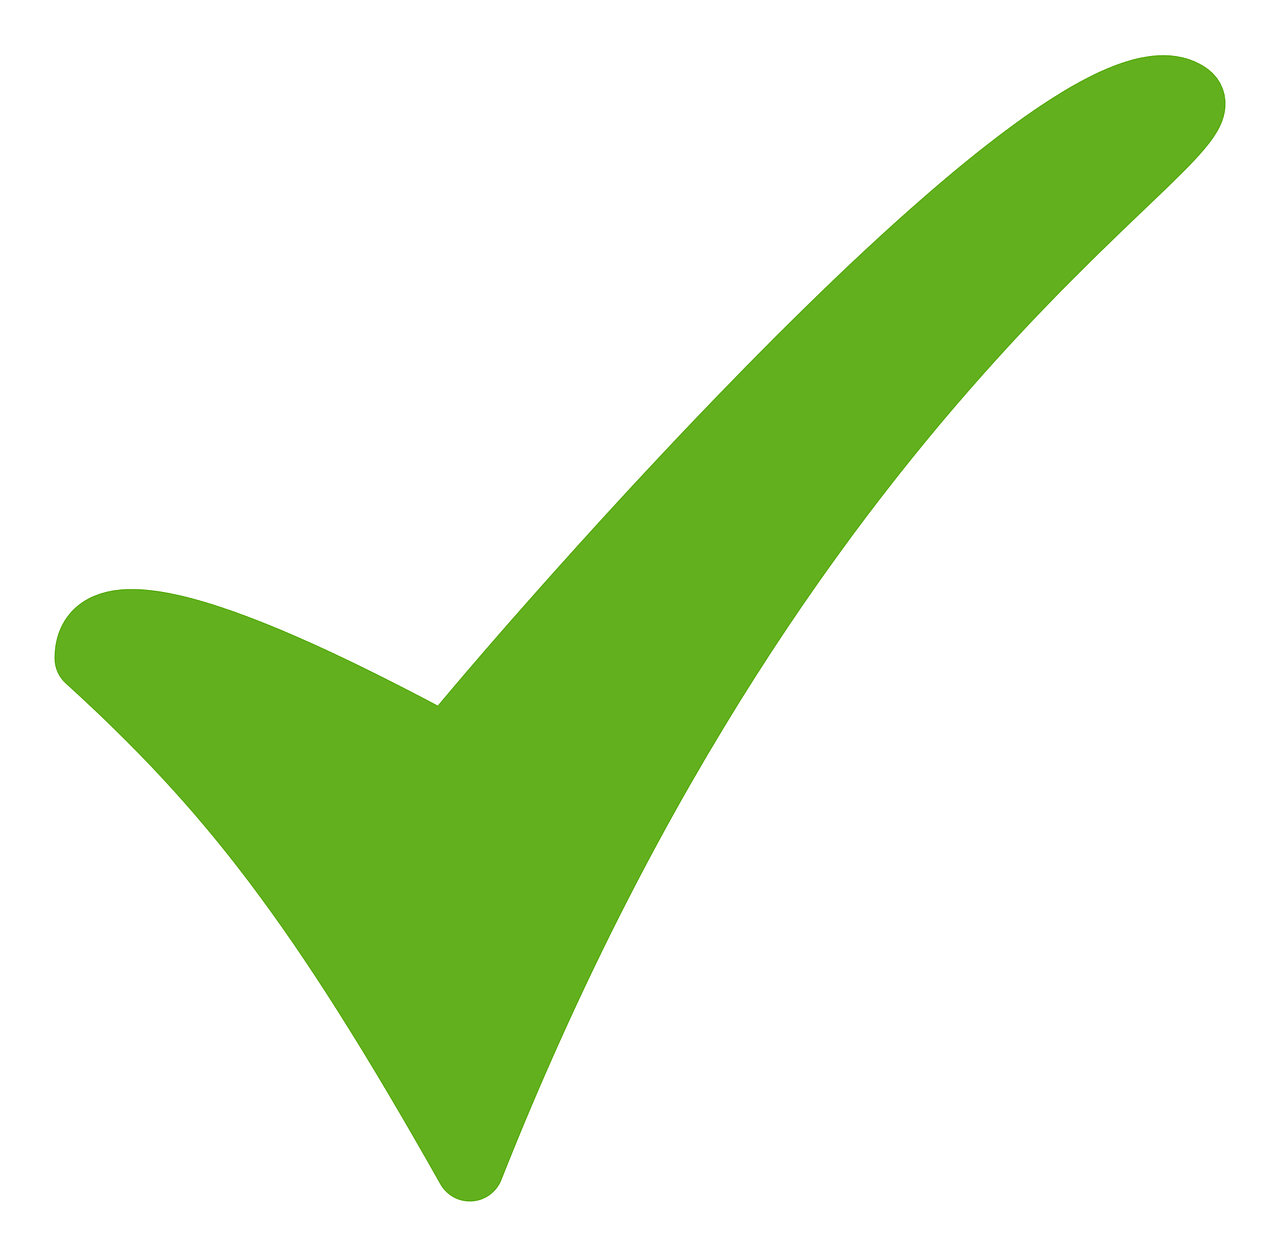 Kent Test Mock: Follow-up Session